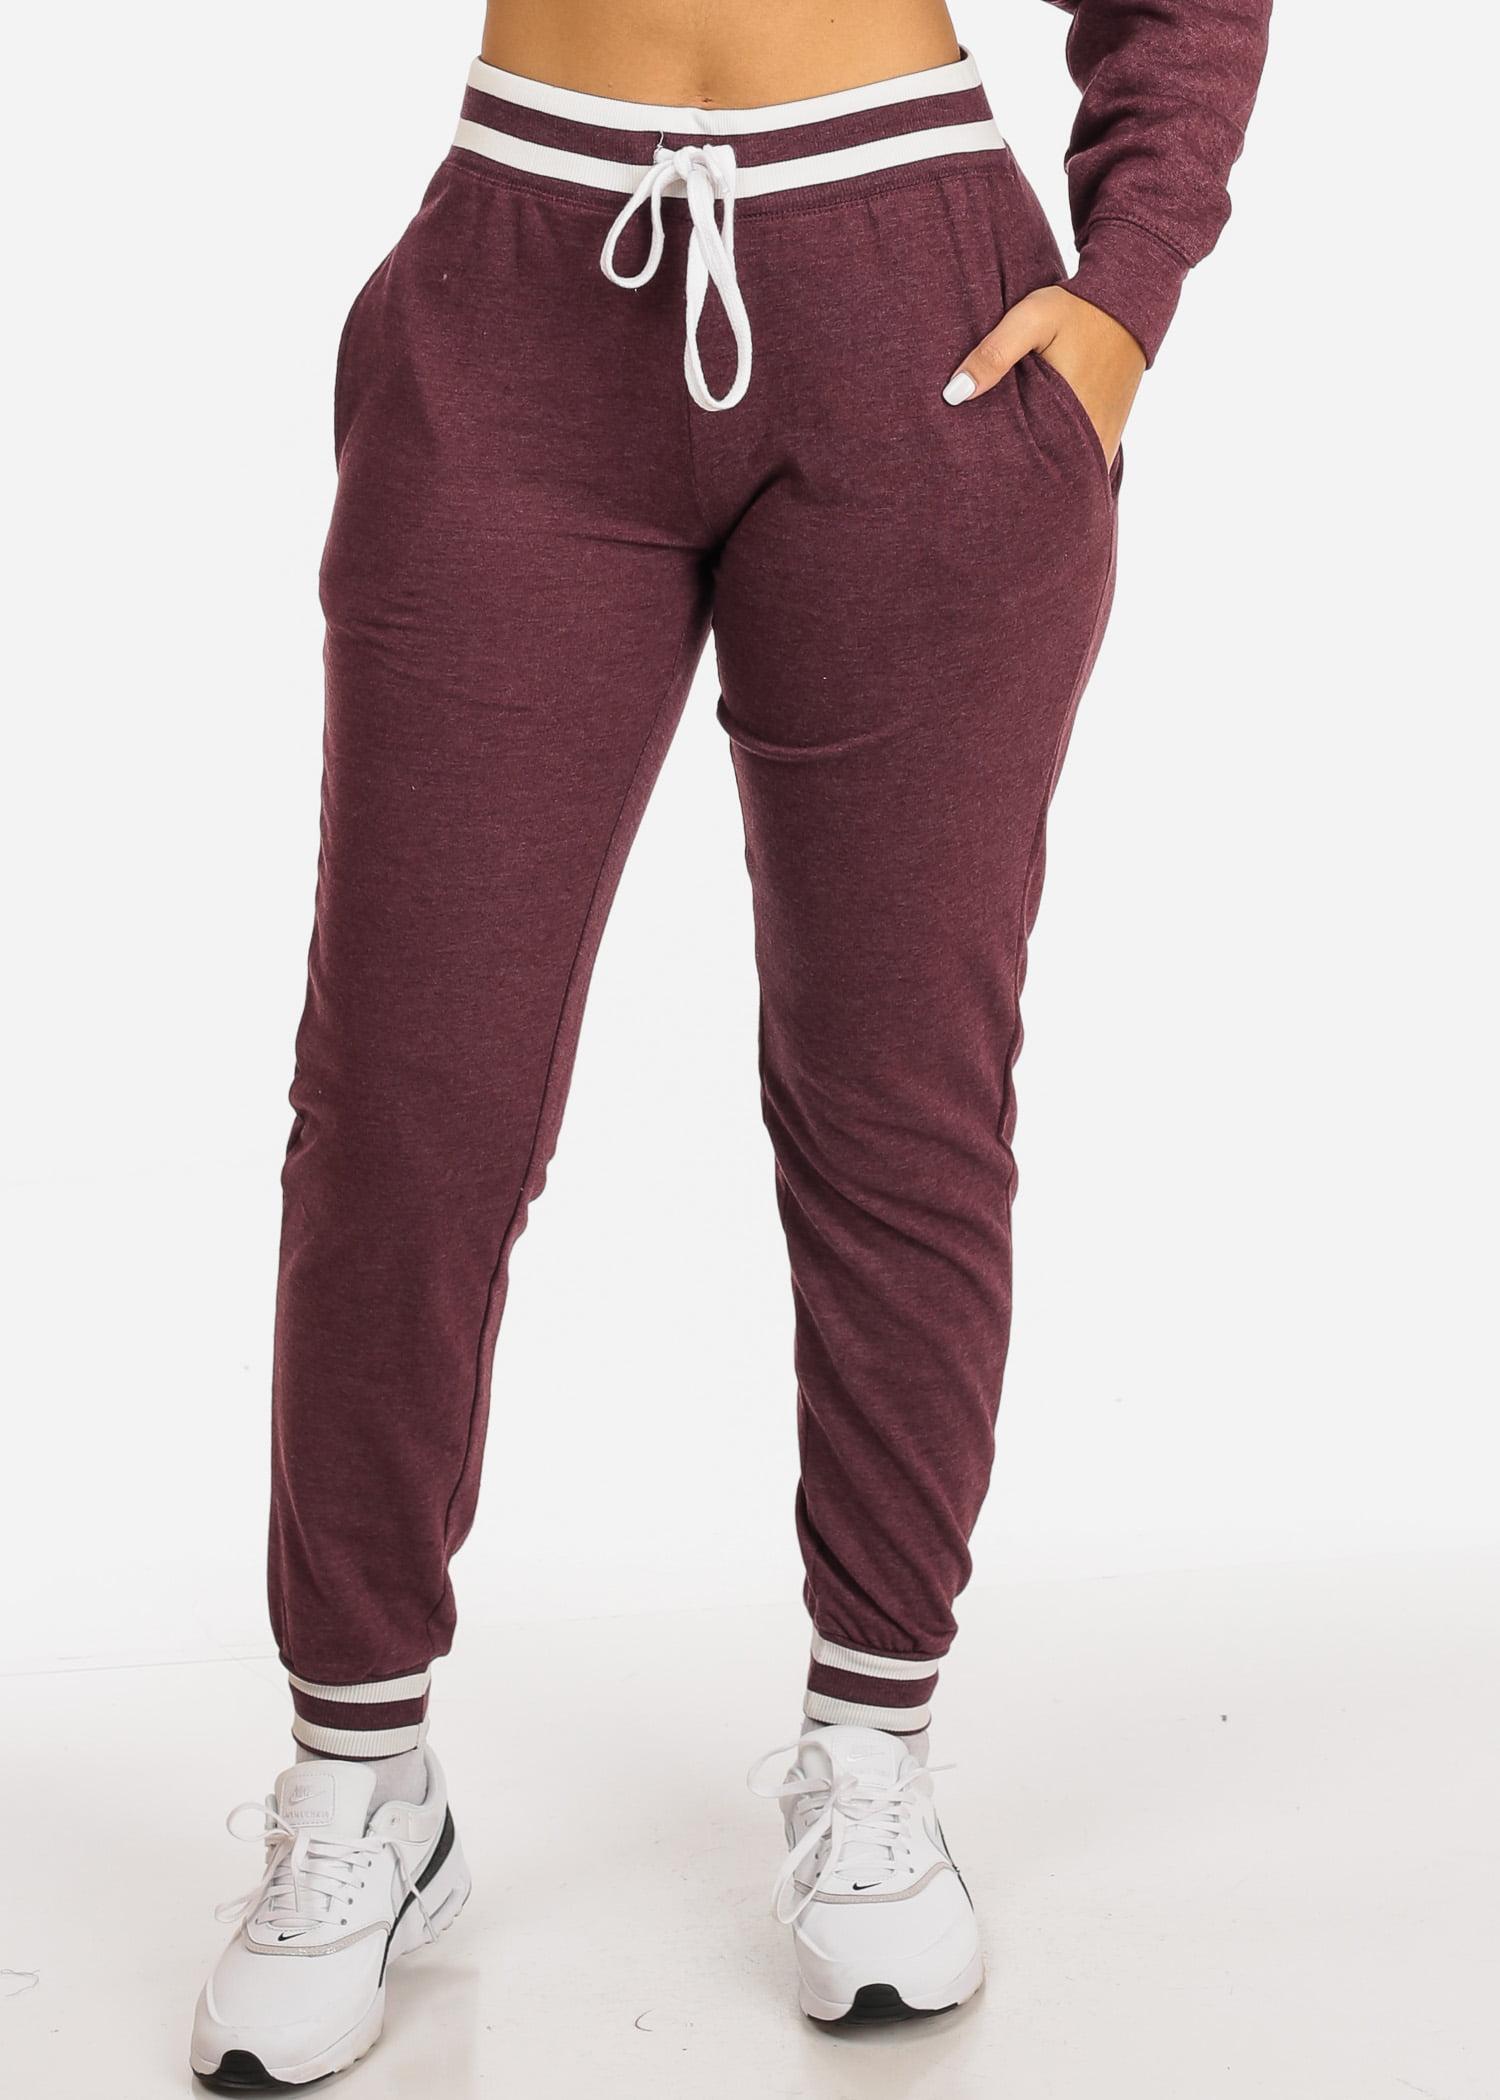 Womens Juniors Casual Burgundy Grey High Rise Drawstring Waist Stripe Detail 2 Pocket Jogger Pants 41012S